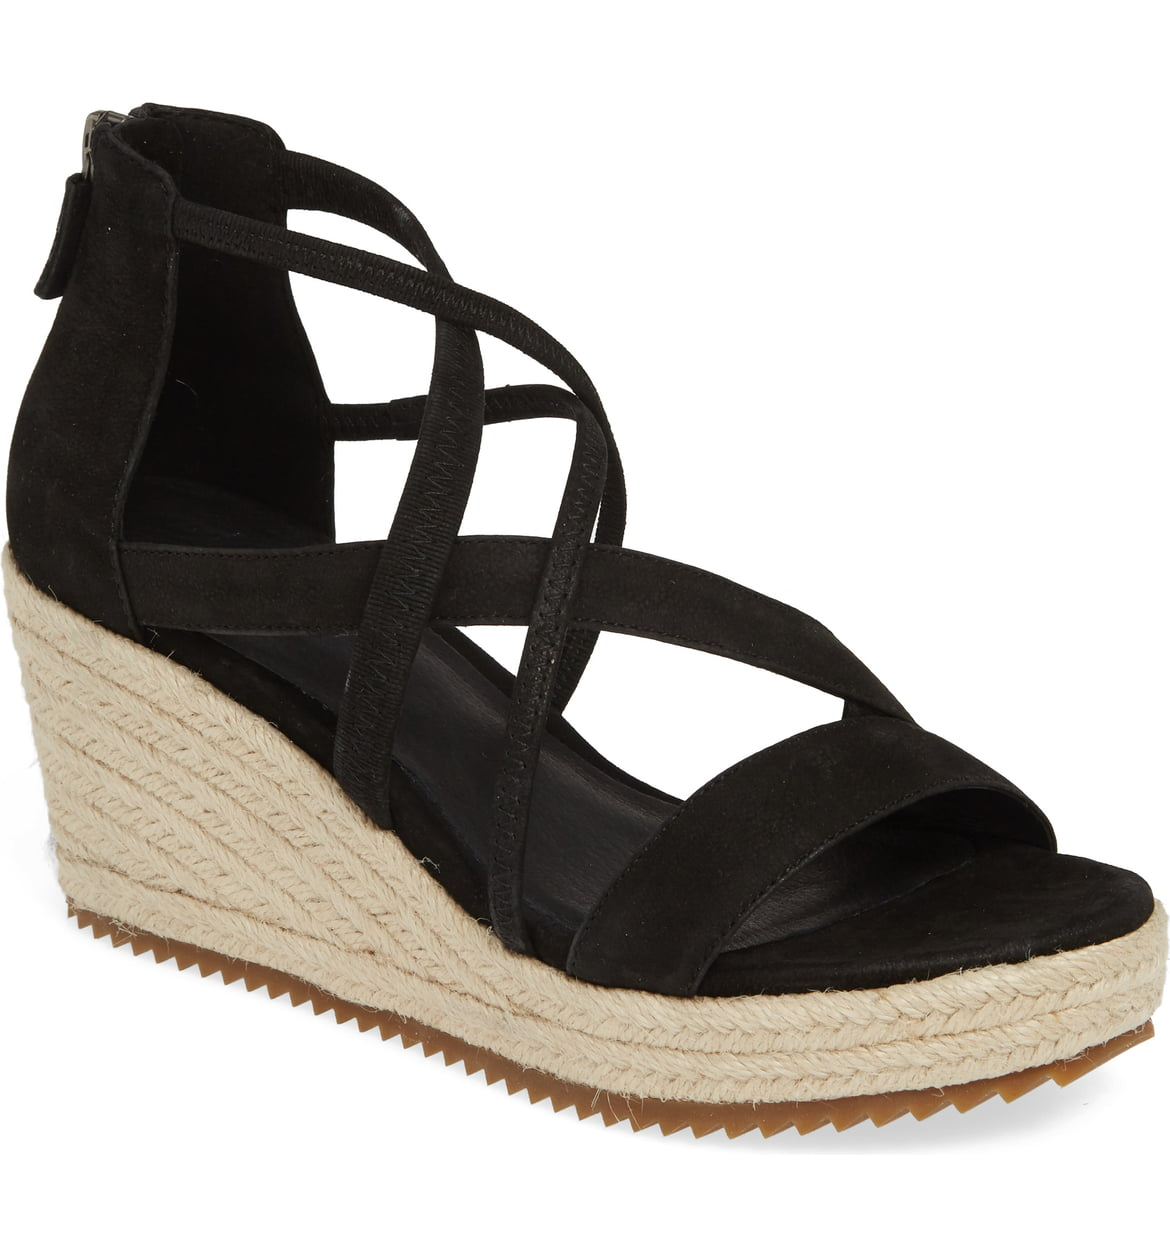 Wanda Cross Strap Wedge Sandal